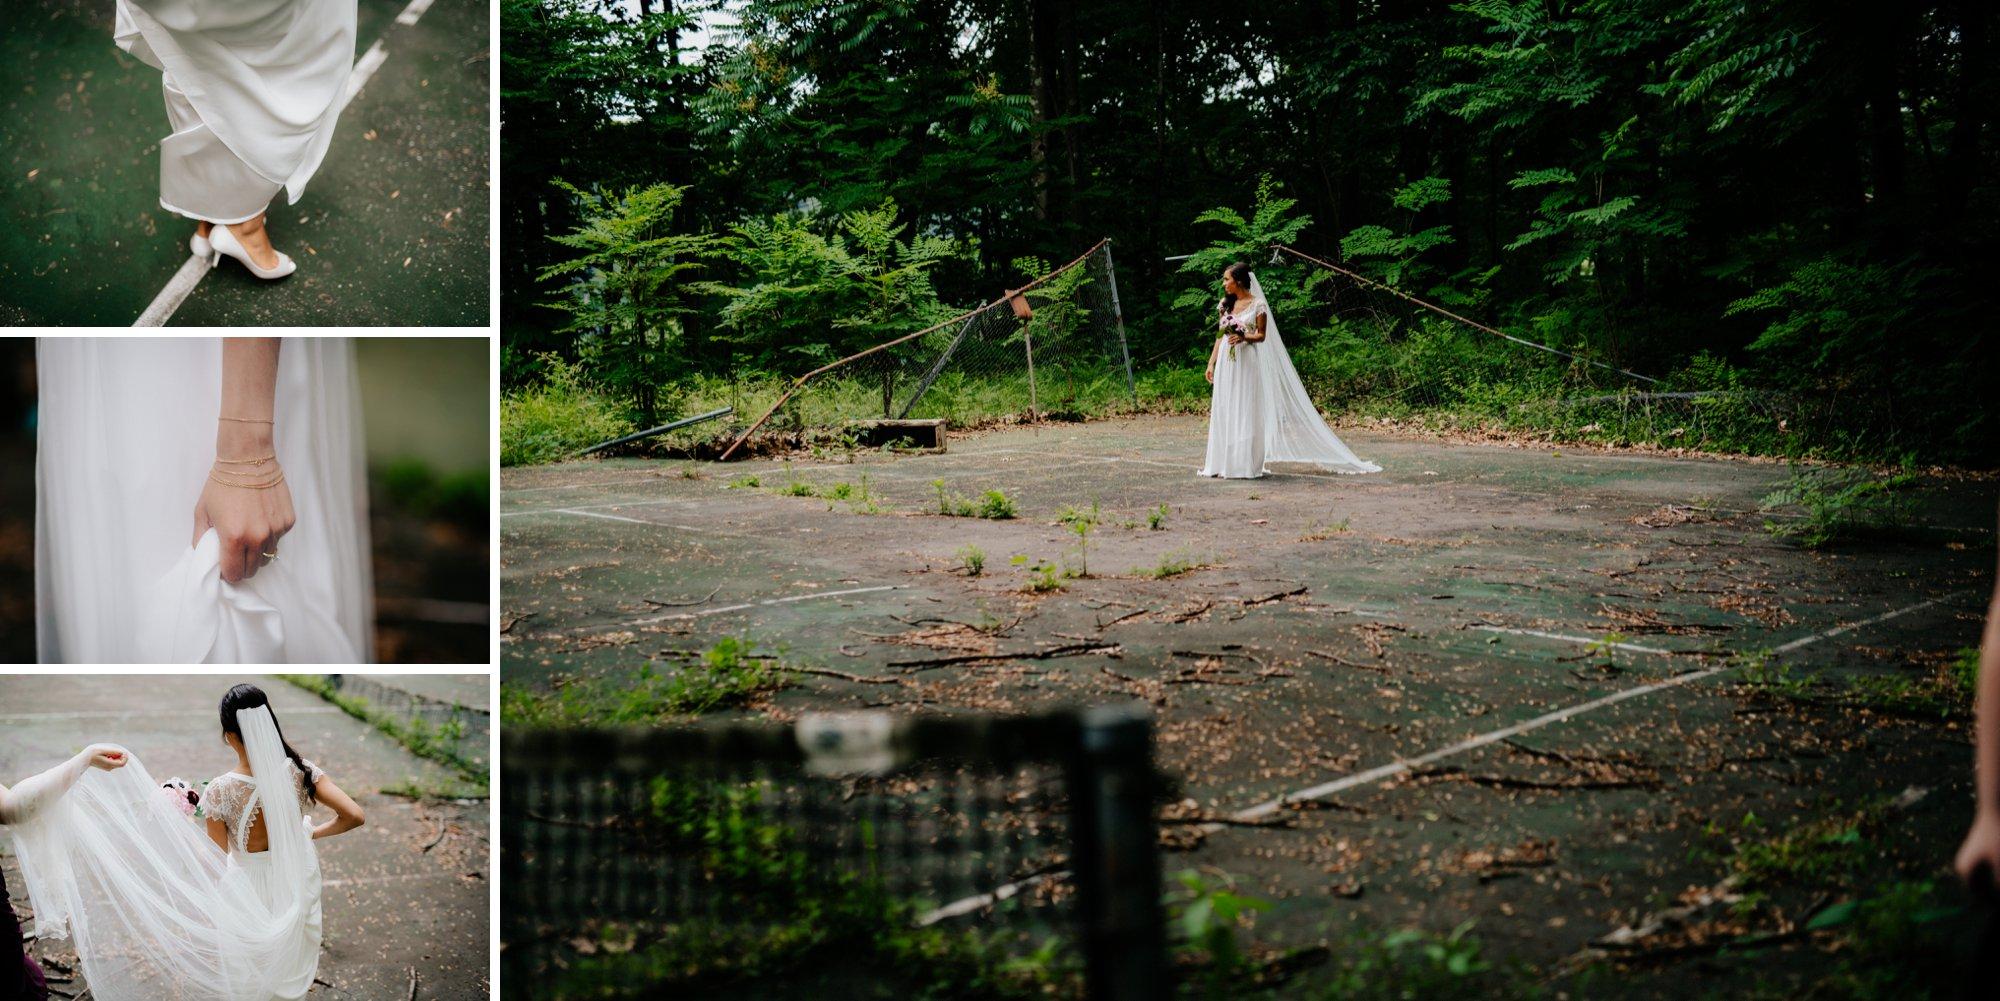 Philadelphia New Jersey Jockey Hollow Wedding Abandoned Athletic Courts Porche Jimmy Choos Tennis Court portrait